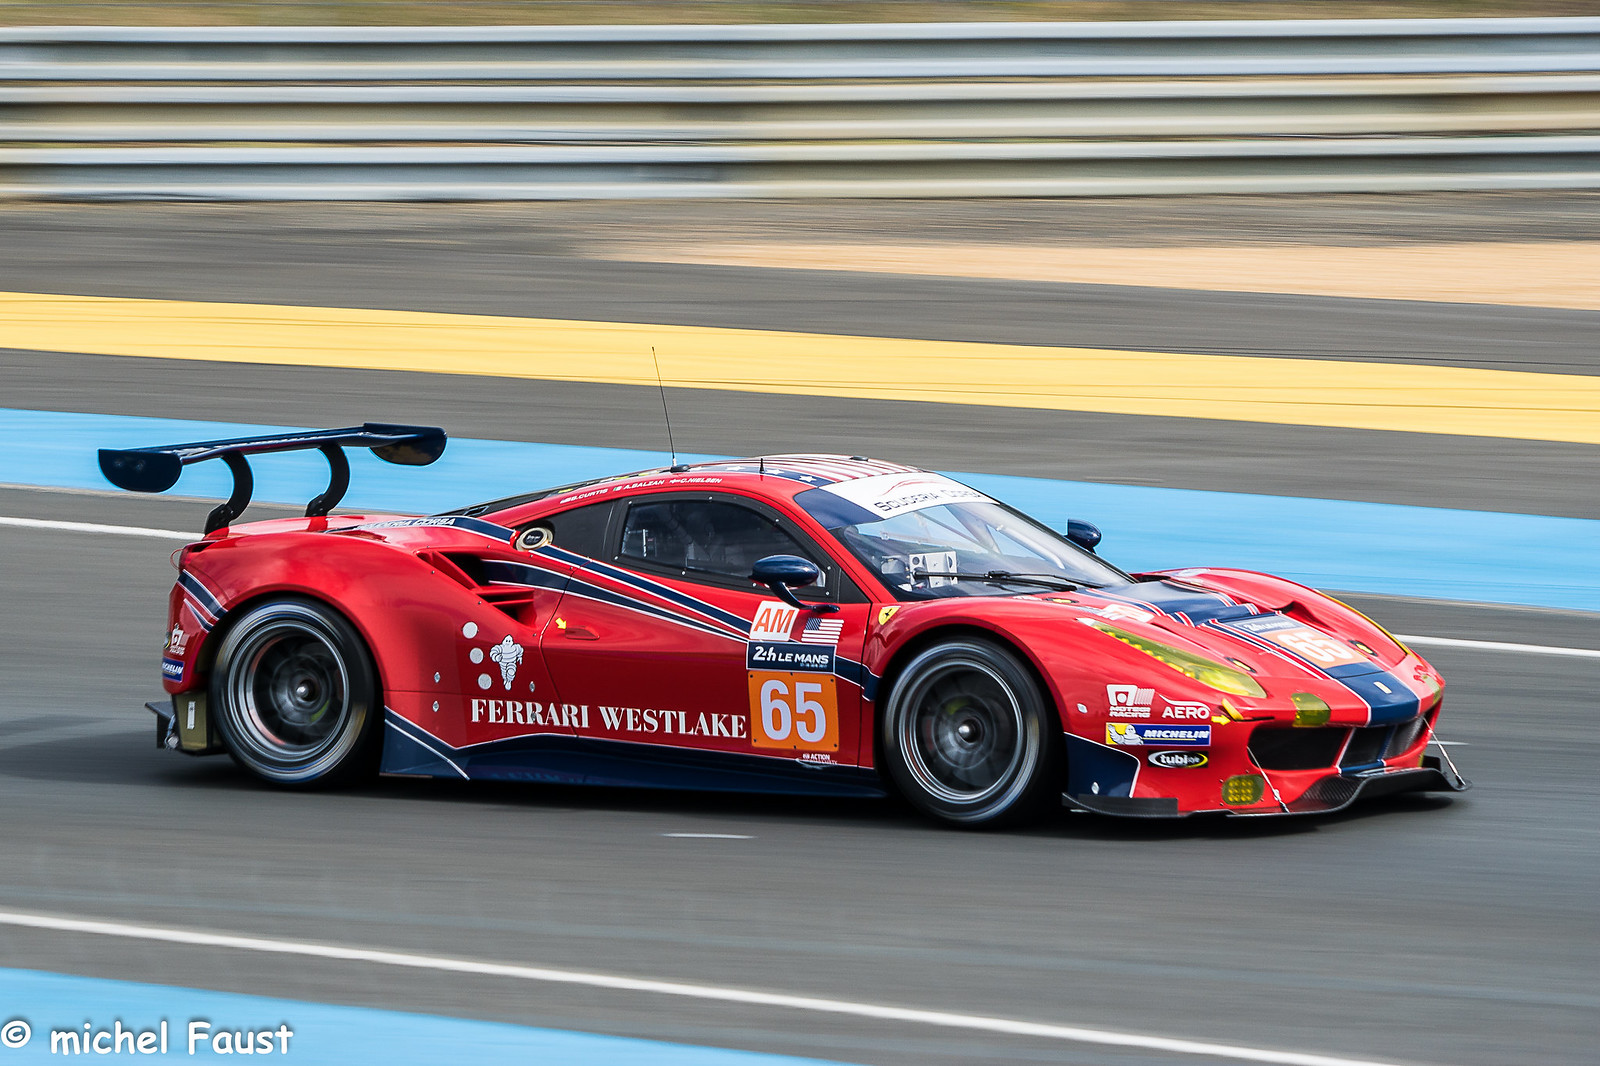 Scuderia Corsa Ferrari 488 GTE, Sony ILCA-77M2, Sony 70-200mm F2.8 G SSM II (SAL70200G2)